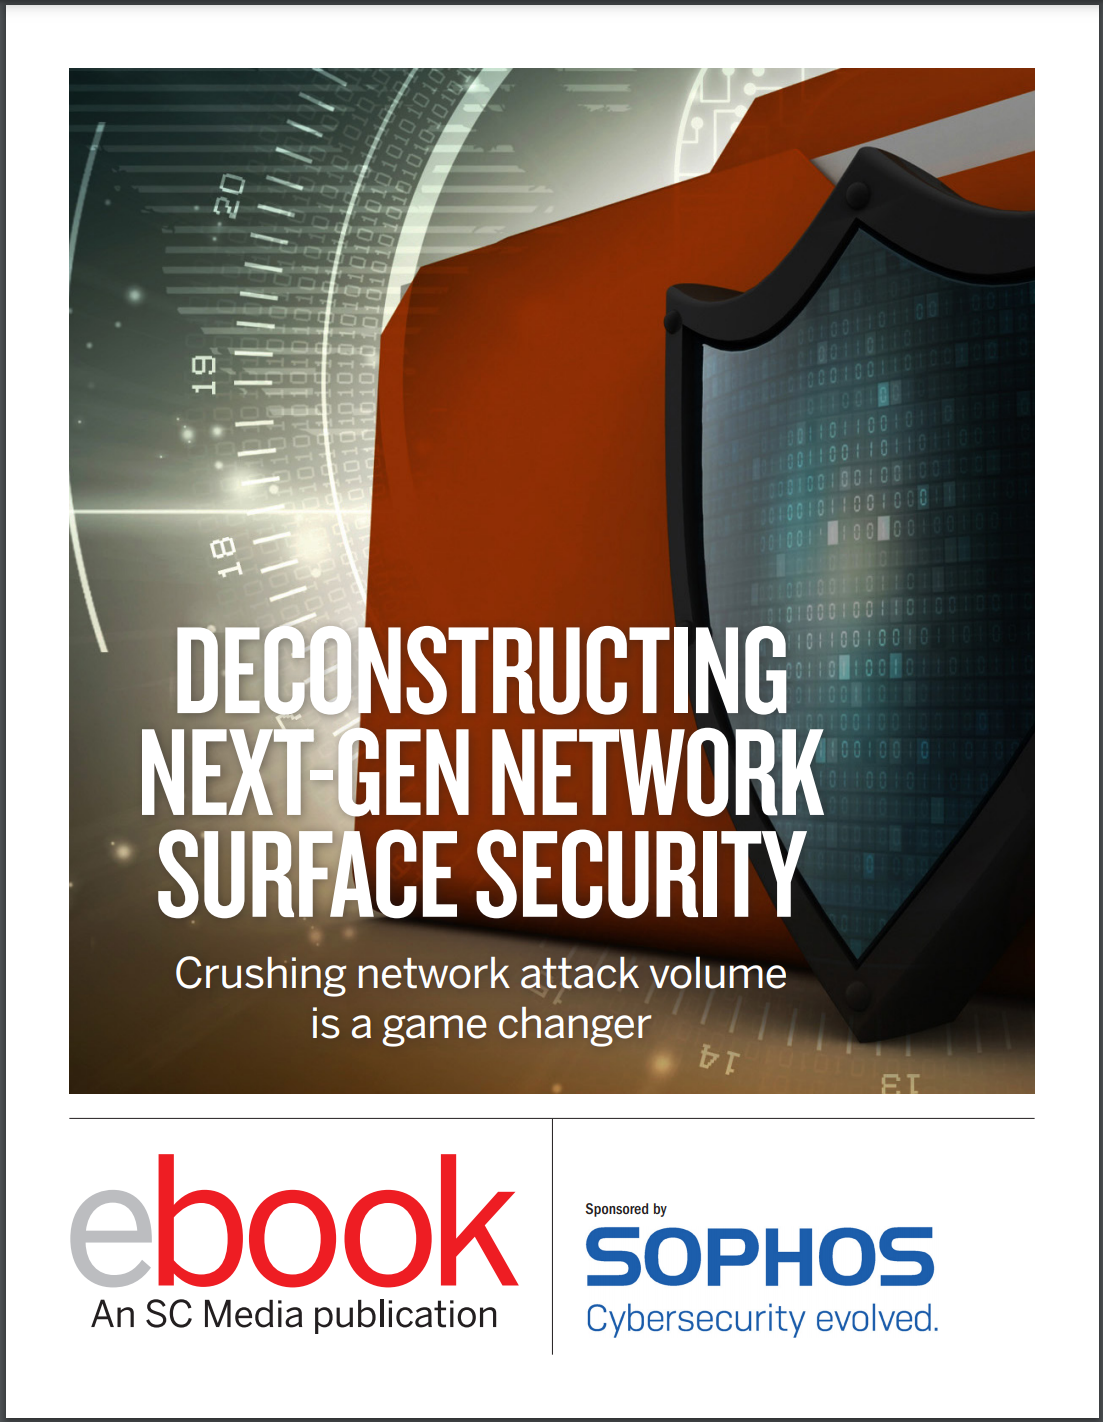 Deconstructing next-gen network surface security